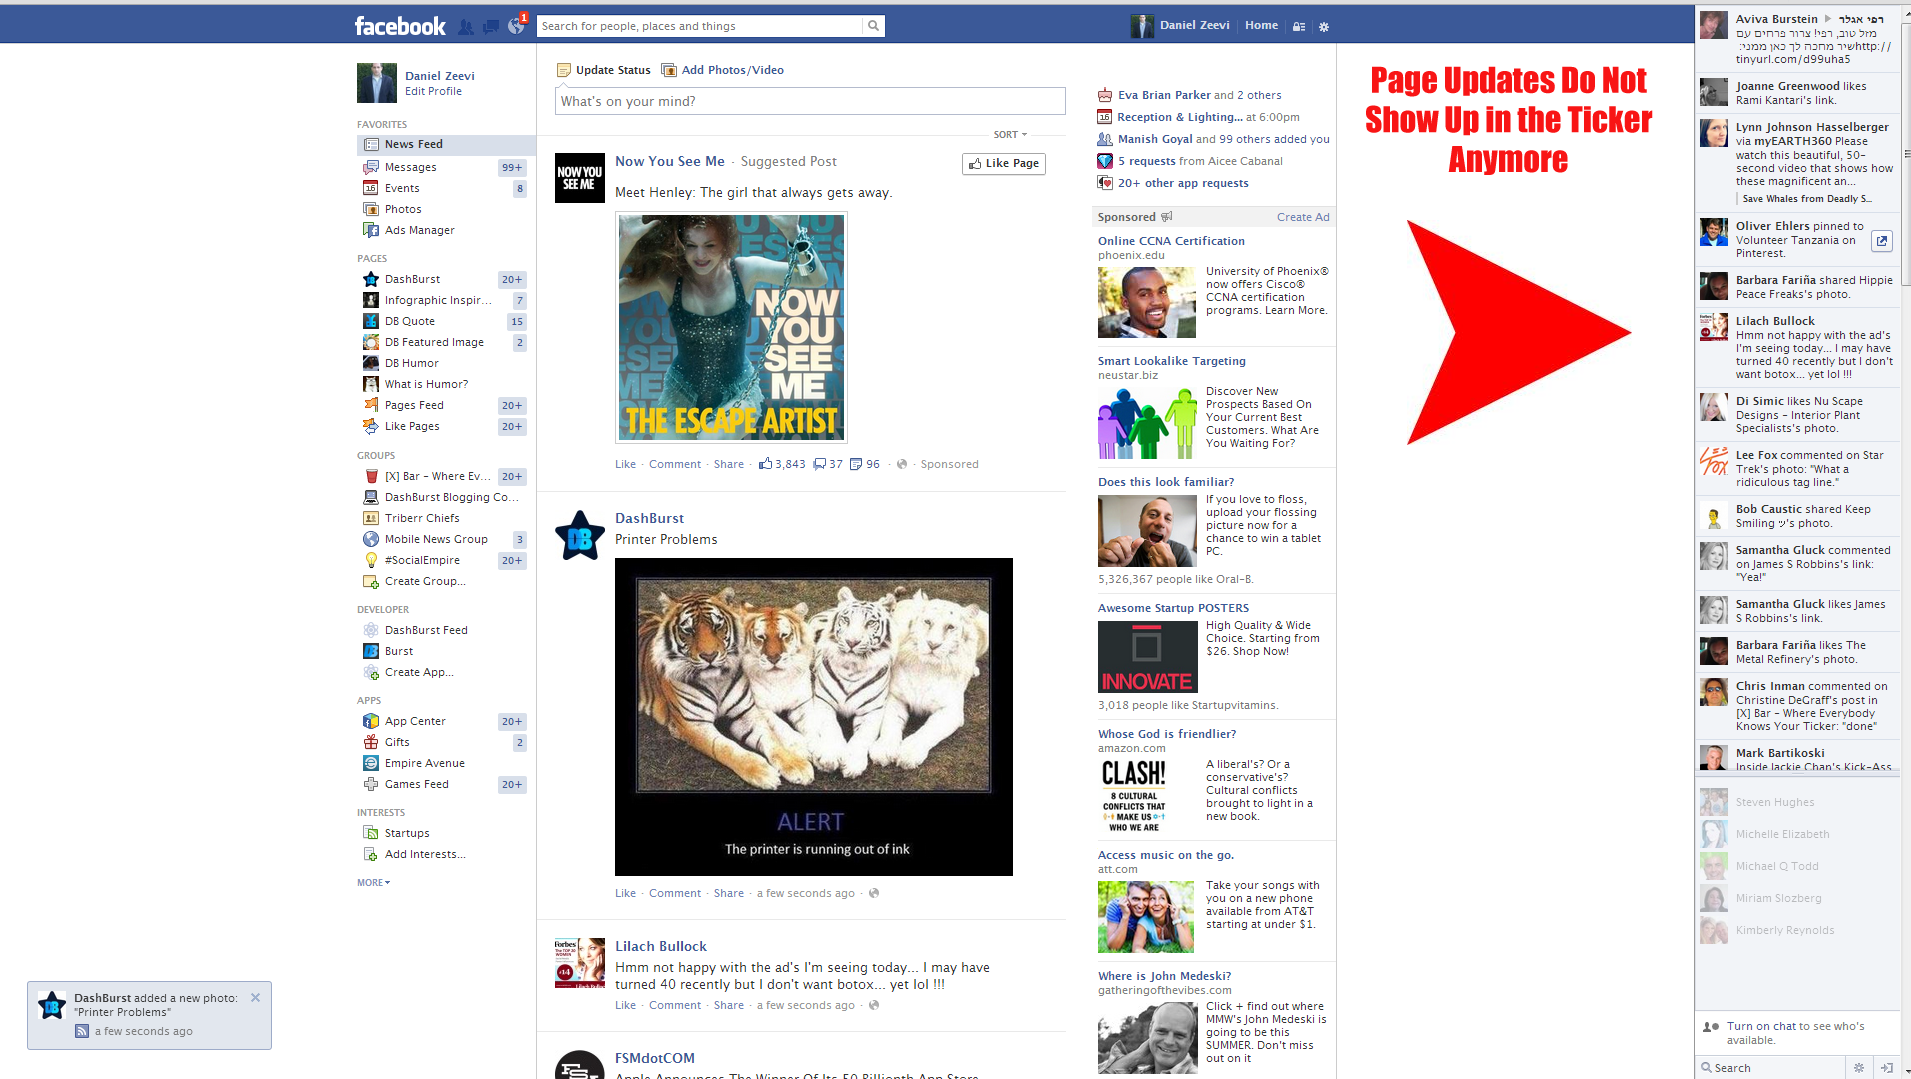 Facebook page updates